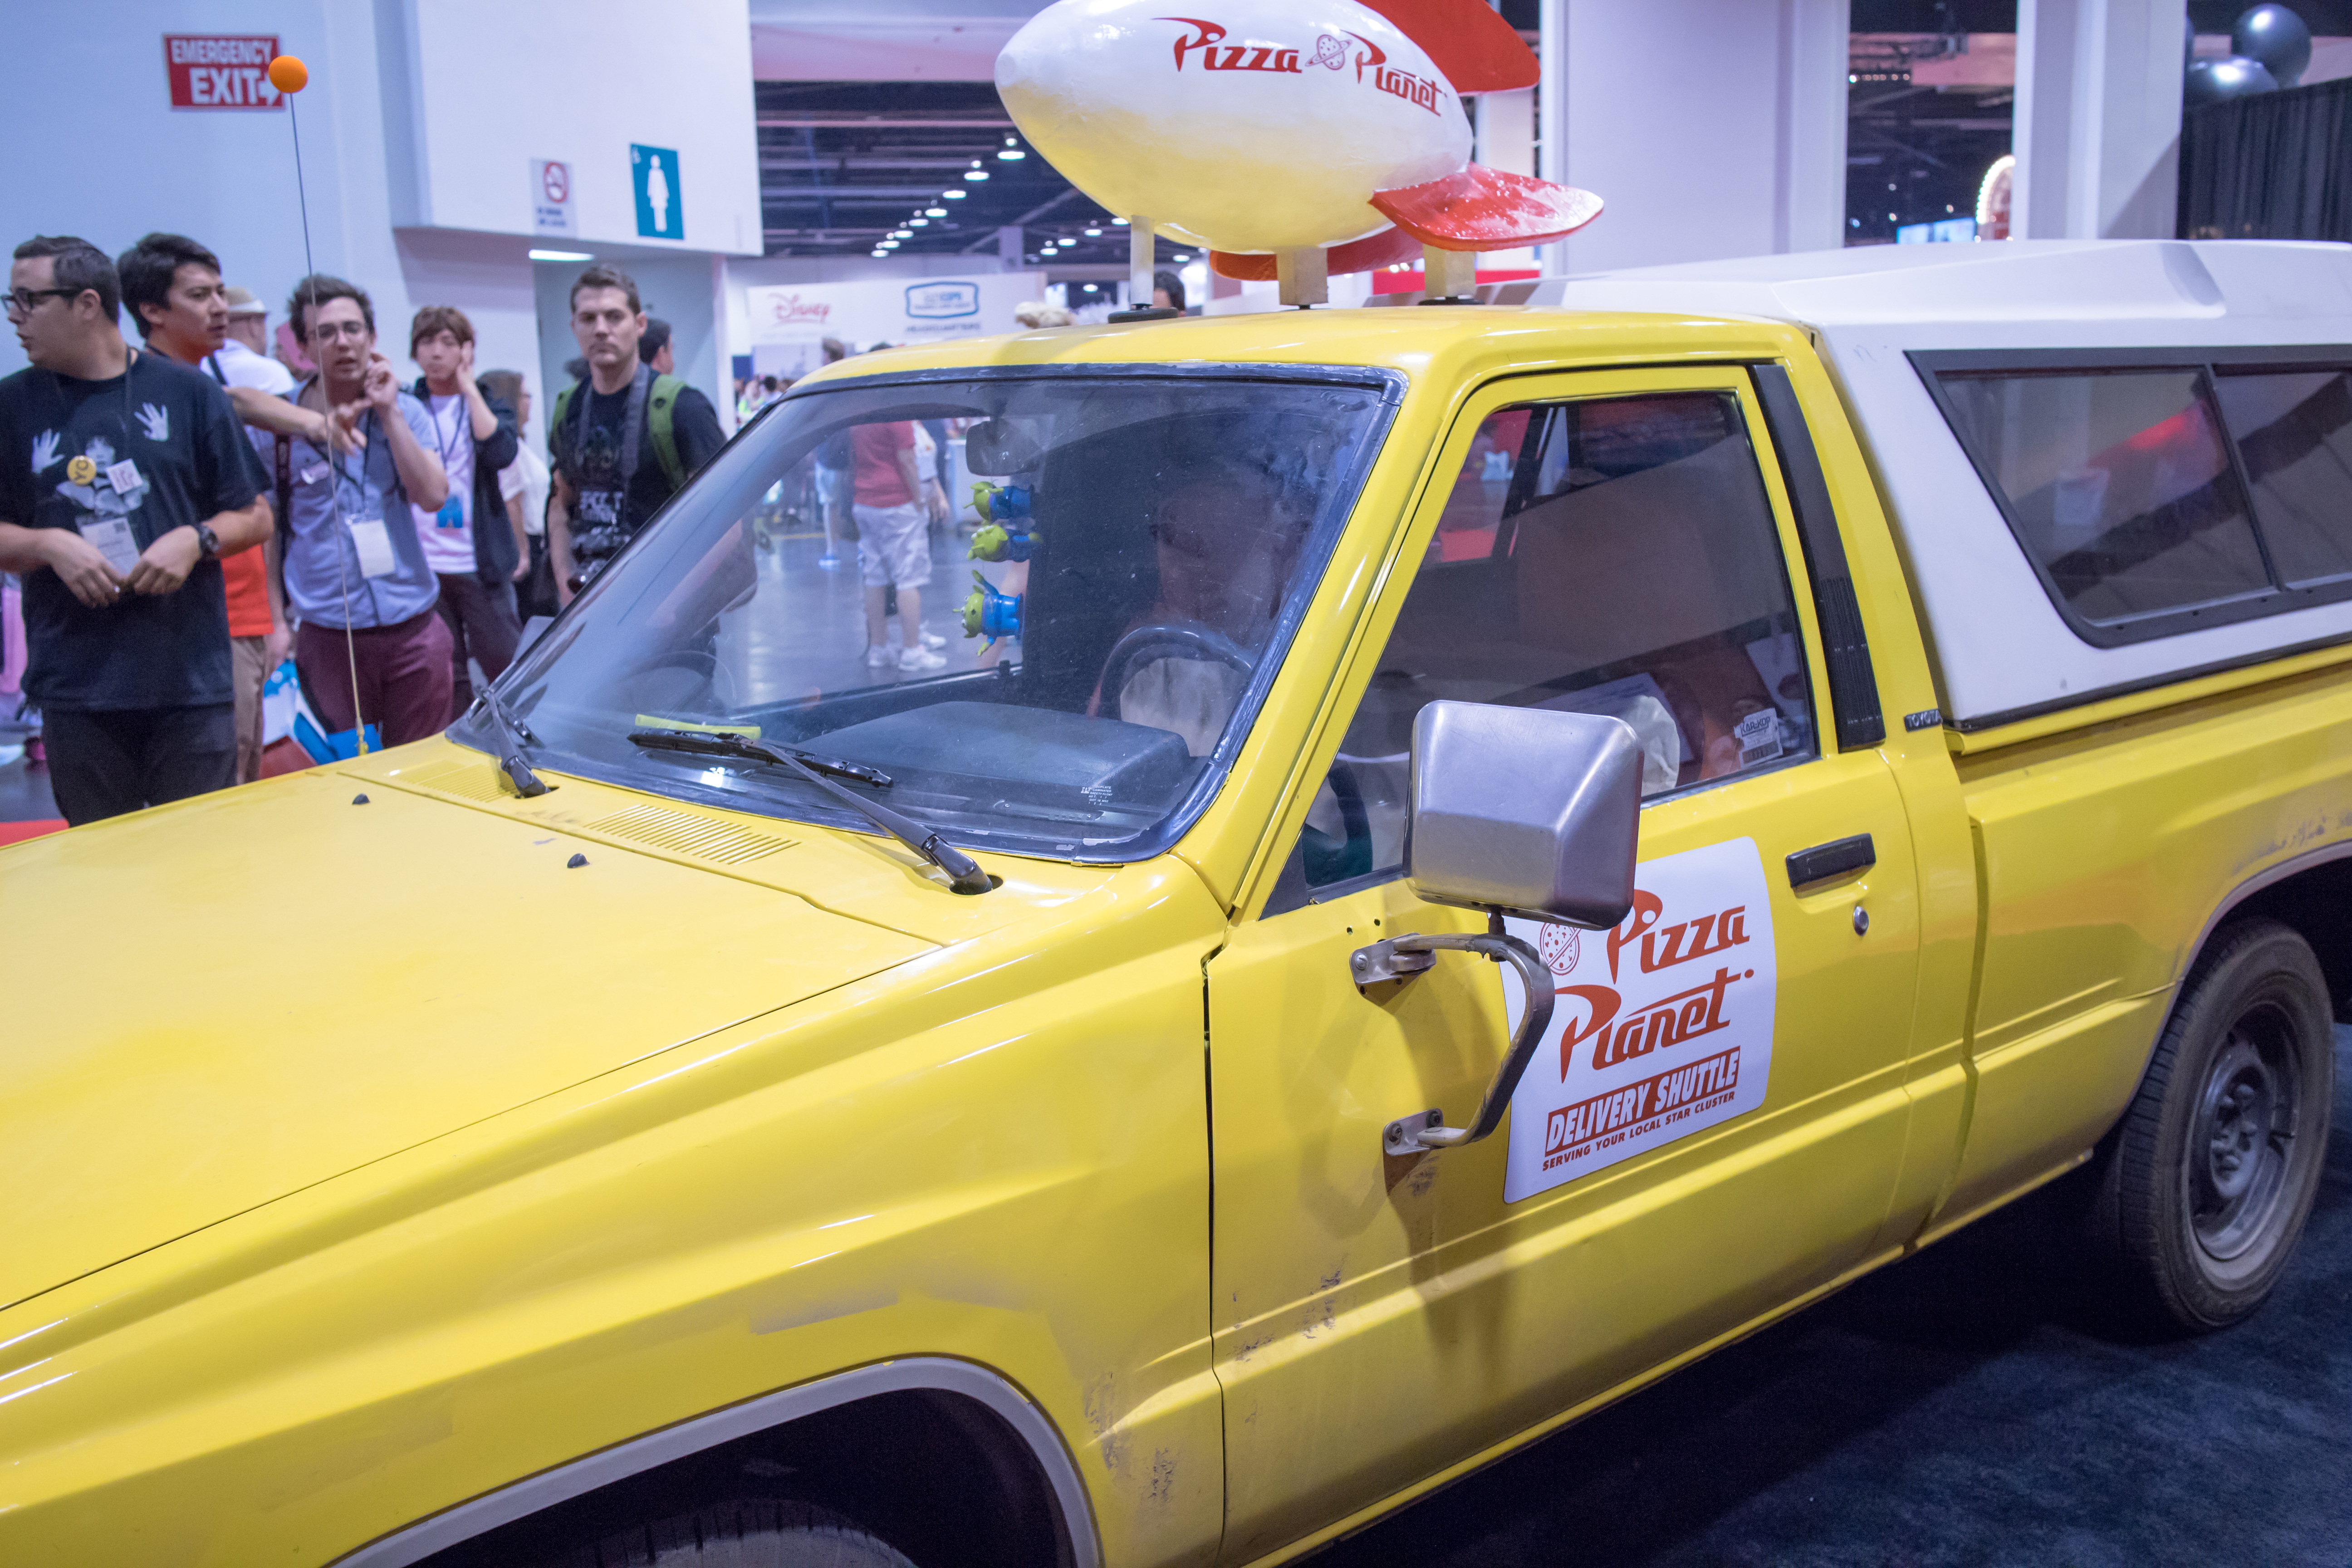 Pizza Truck With Exhibition Kitchen